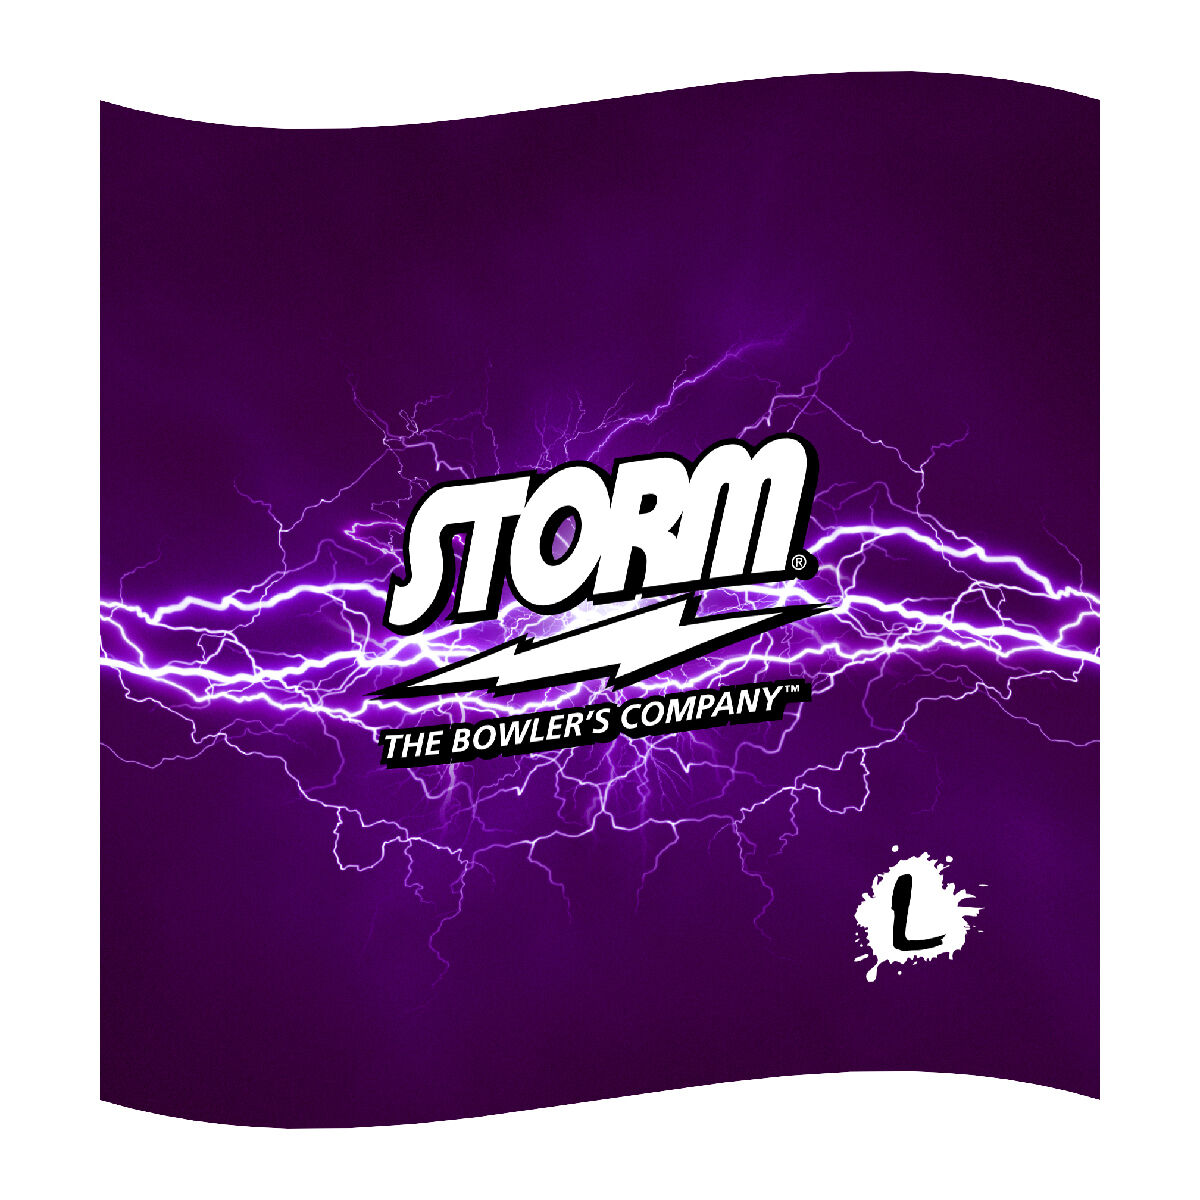 """Storm Bowling Dye-sublimated Microfiber Towel - 16""""x16"""" High Quality Print"""